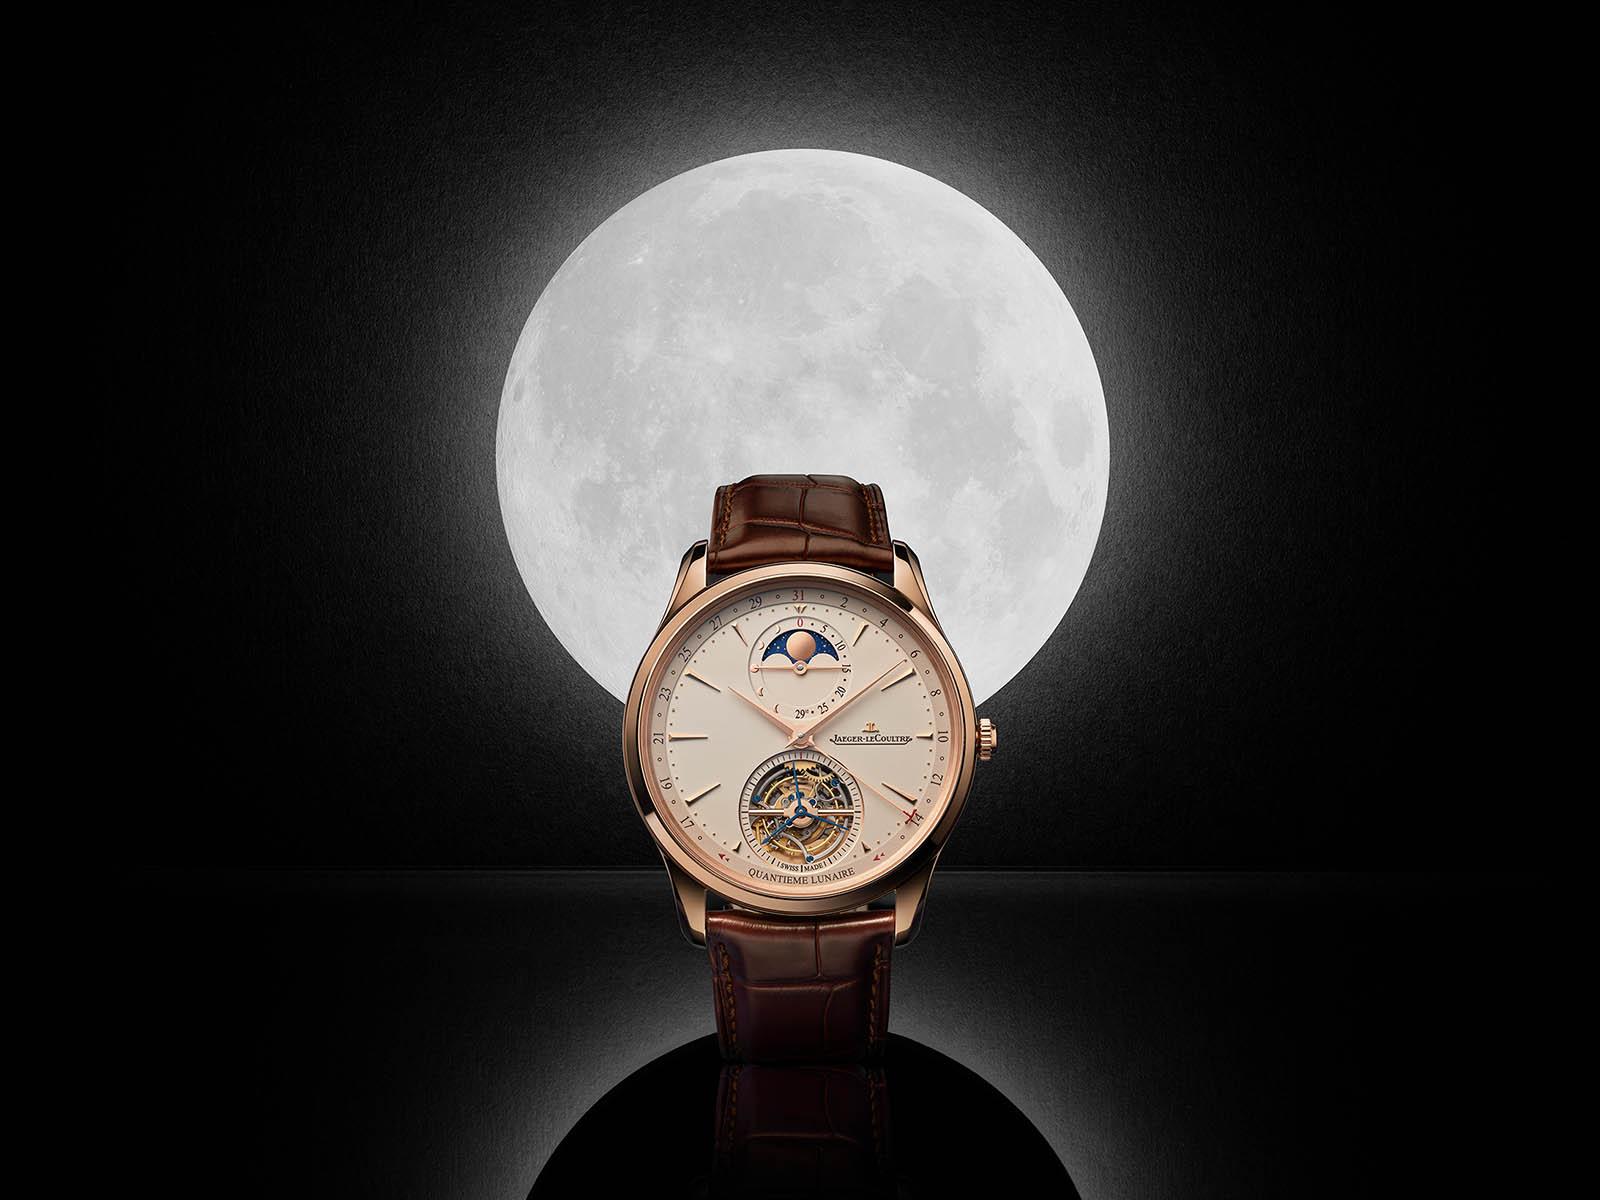 q1692410-jaeger-lecoultre-master-ultra-thin-tourbillon-moon-2.jpg